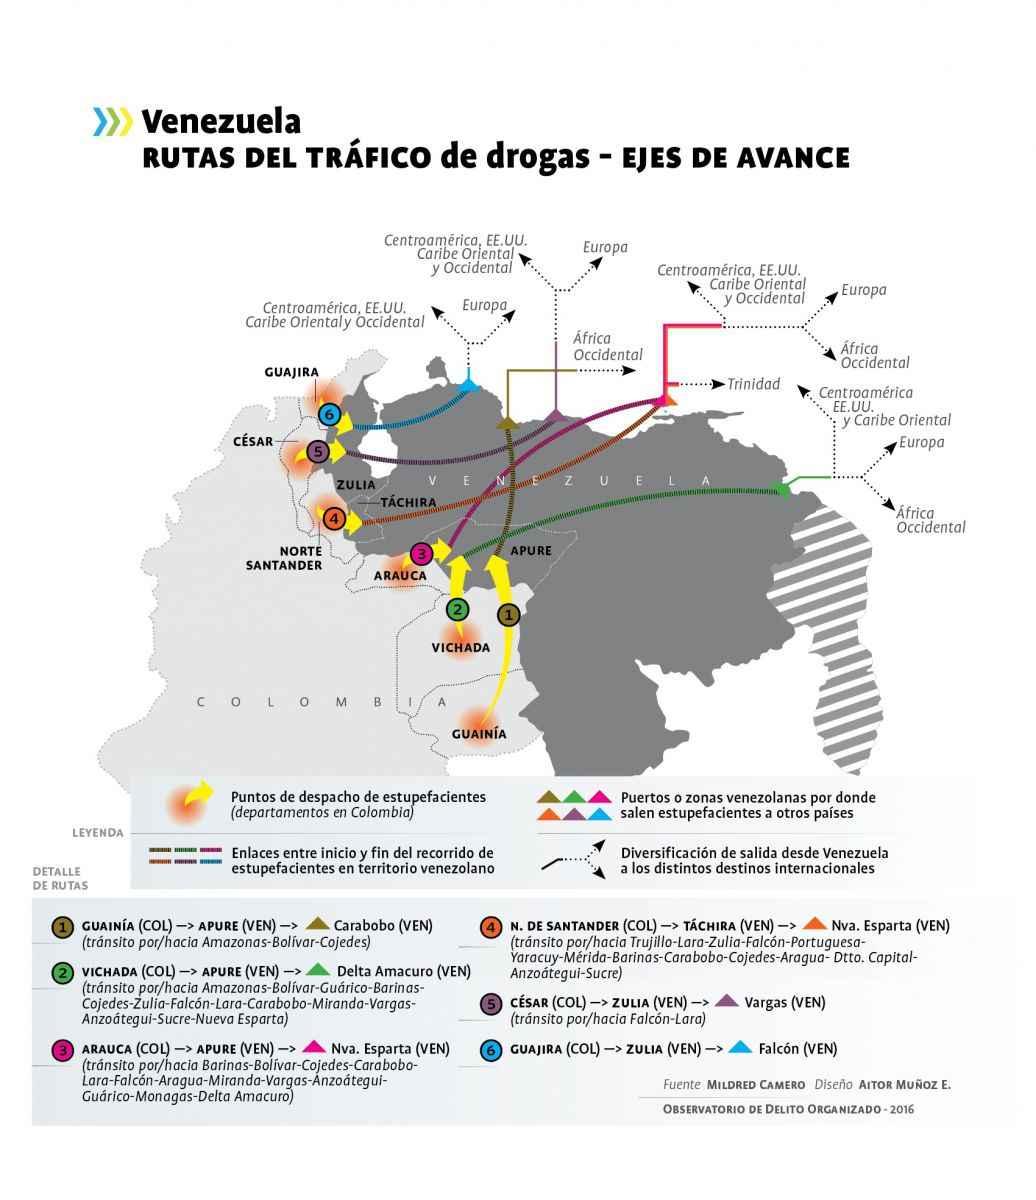 FINAL --- Mapa-Vzla-Rutas y Ejes de Avance-Narcotráfico-DEF